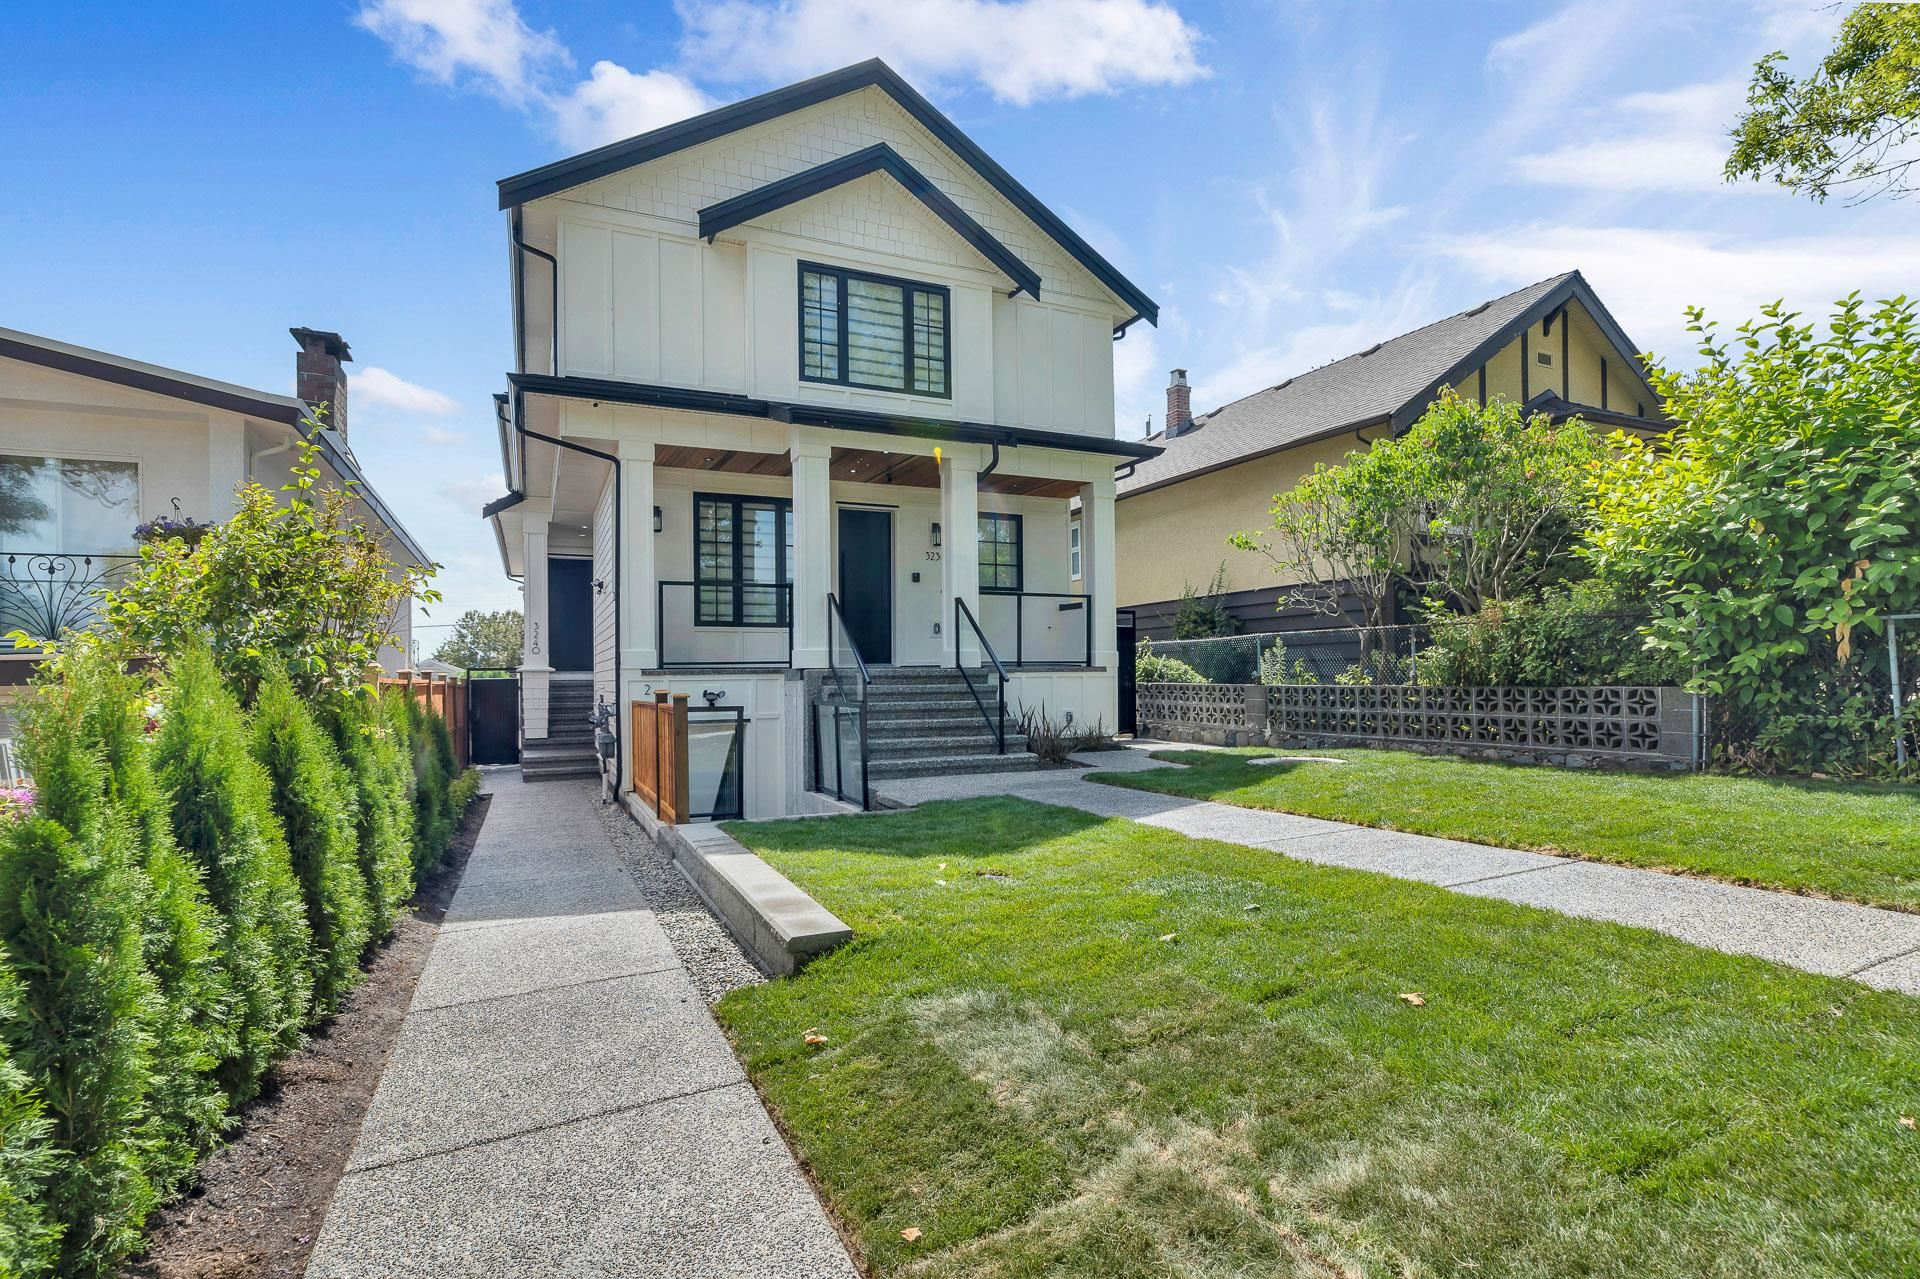 3240 E PENDER STREET - Renfrew VE 1/2 Duplex for sale, 5 Bedrooms (R2608462) - #1